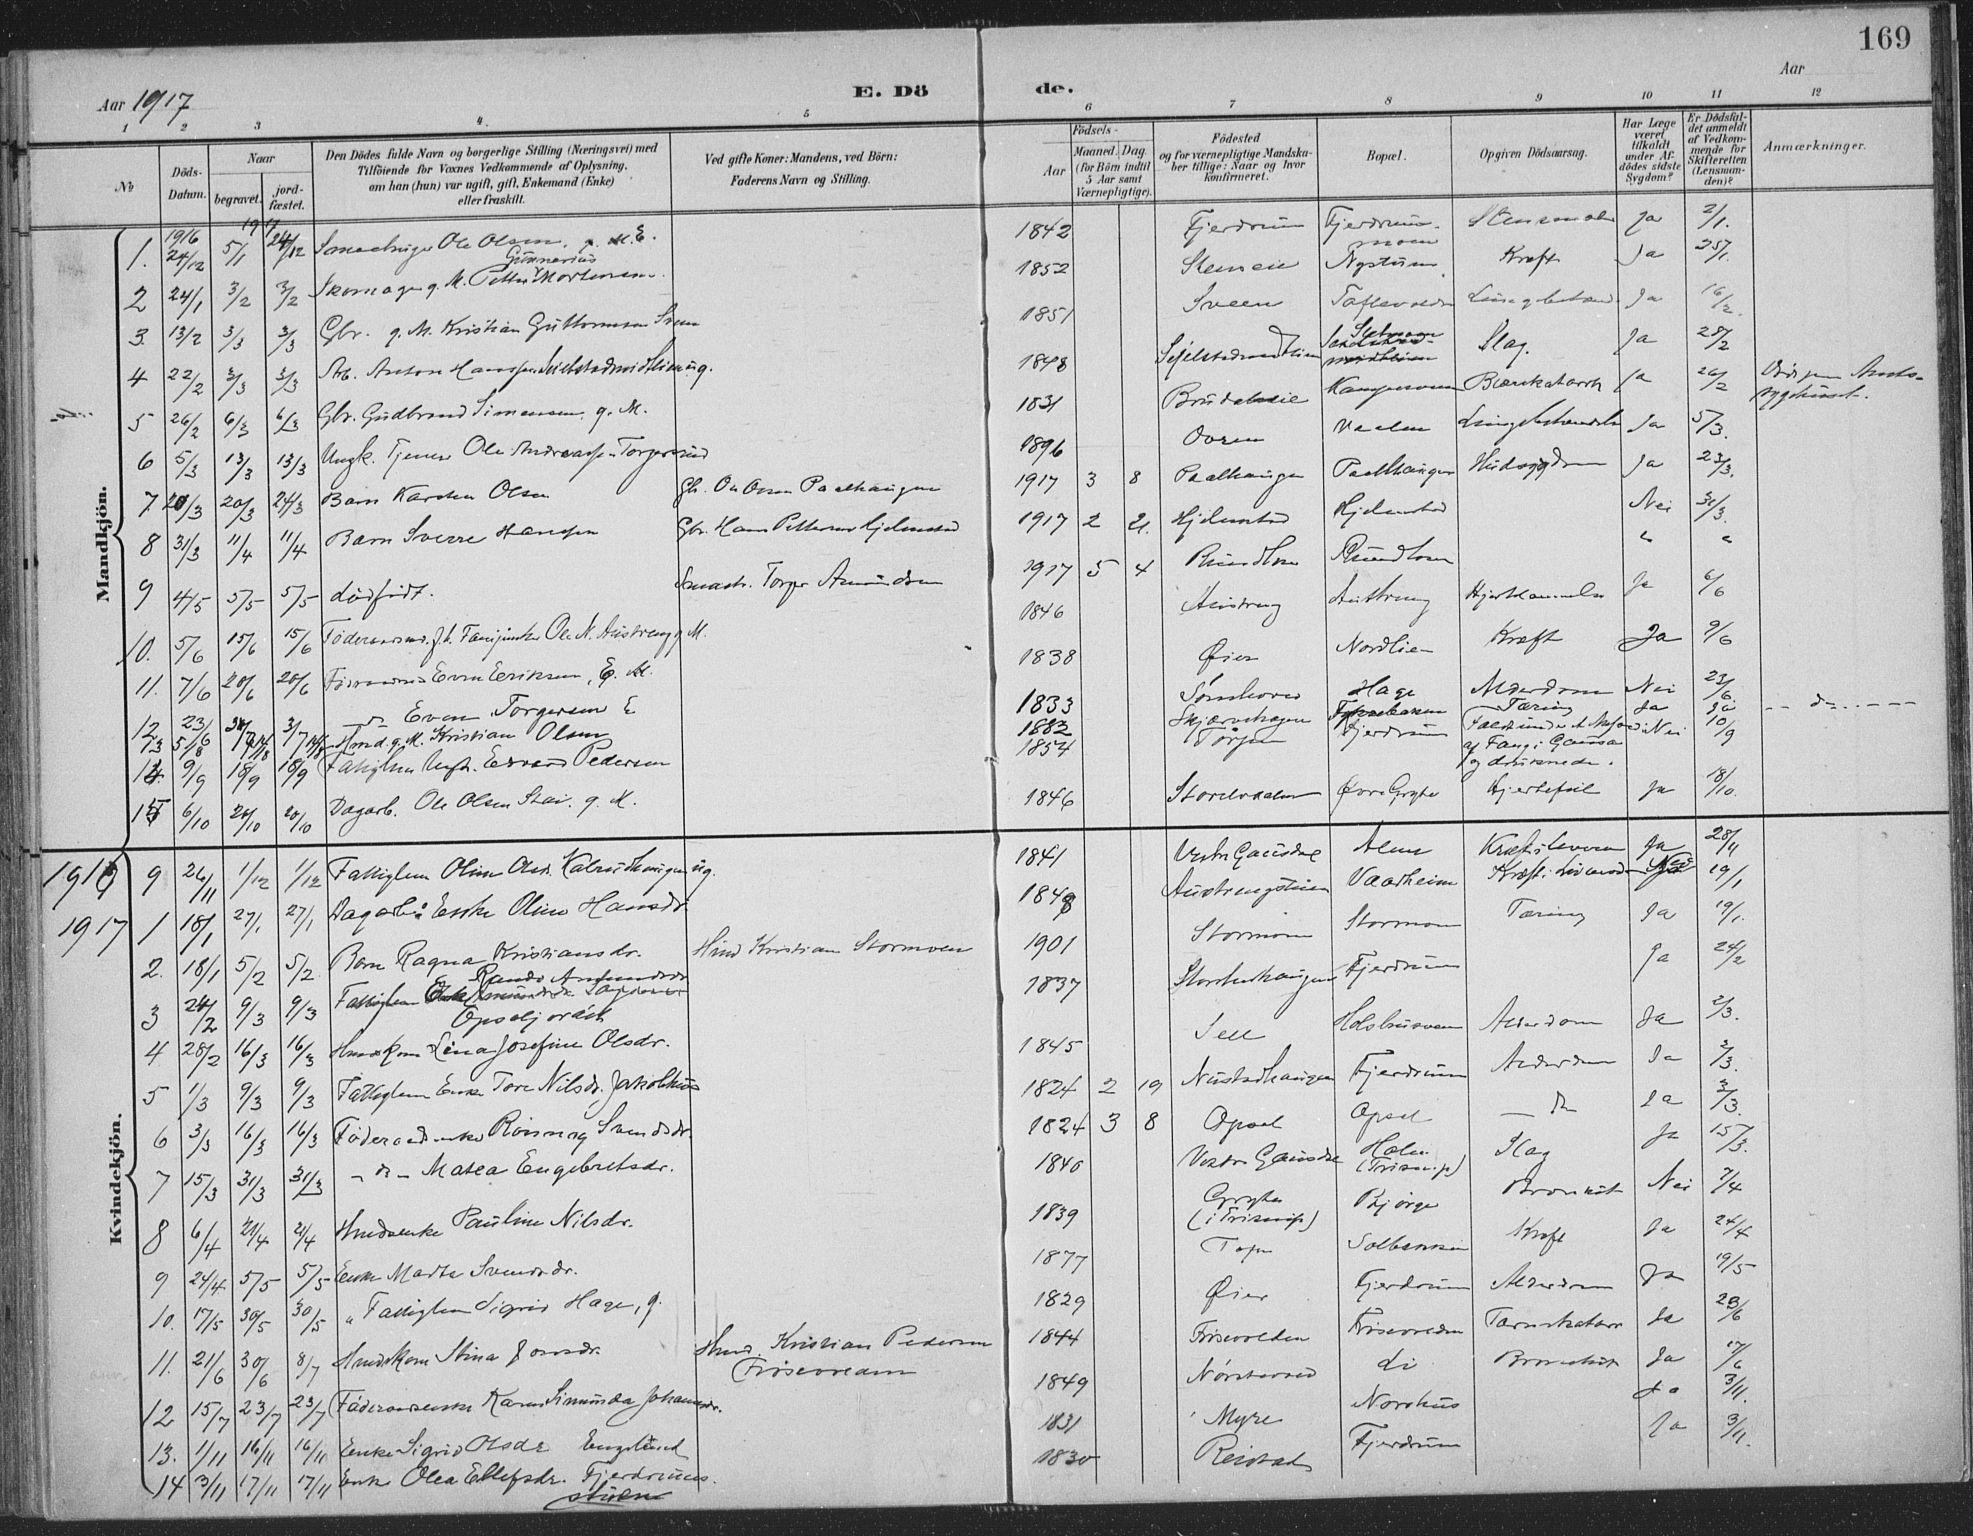 SAH, Østre Gausdal prestekontor, Ministerialbok nr. 4, 1898-1914, s. 169